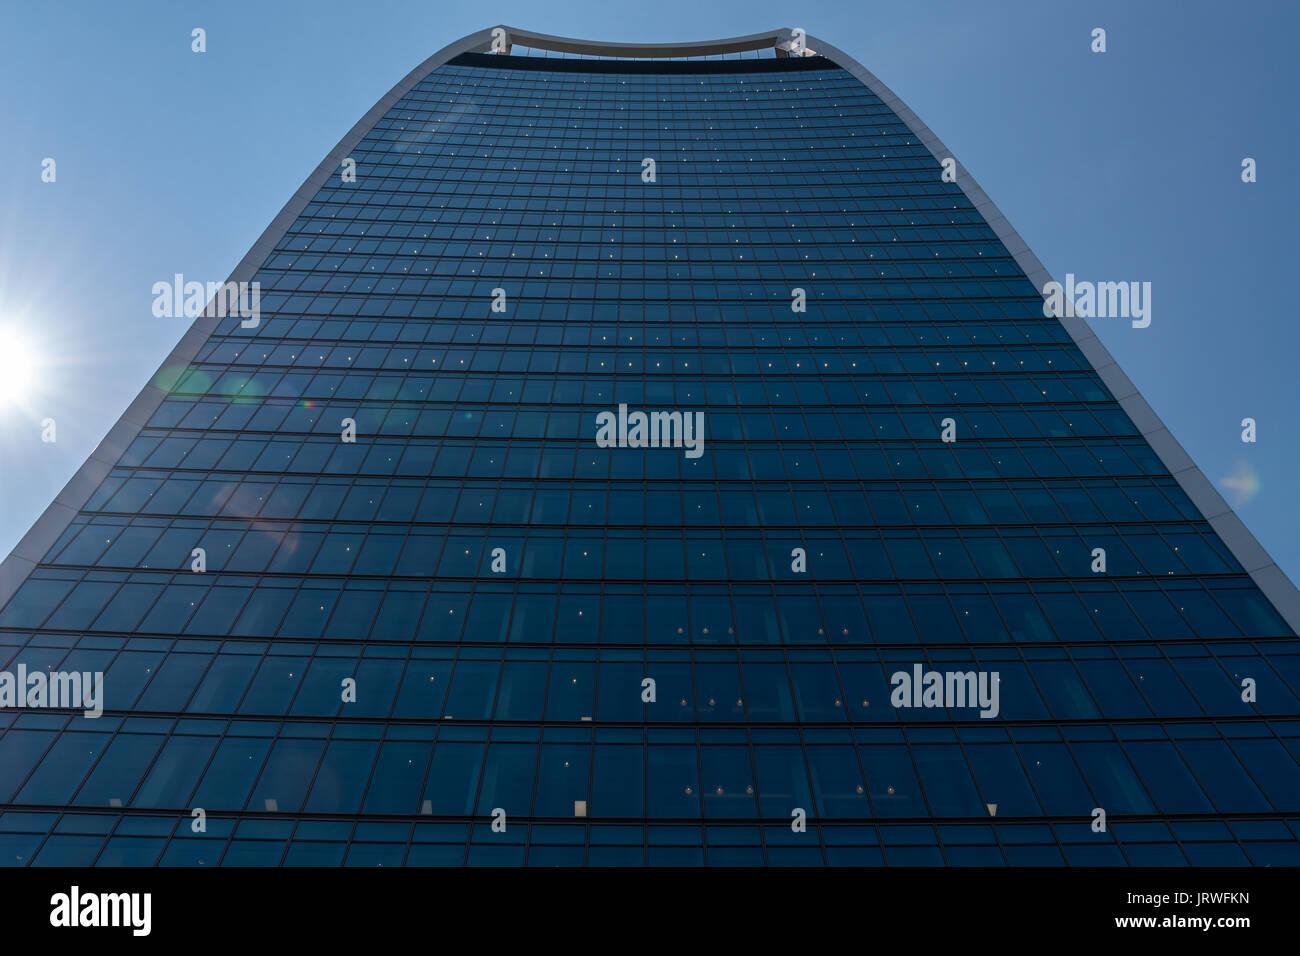 Walkie Talkie Building - 20 Fenchurch St, London EC3M - Stock Image